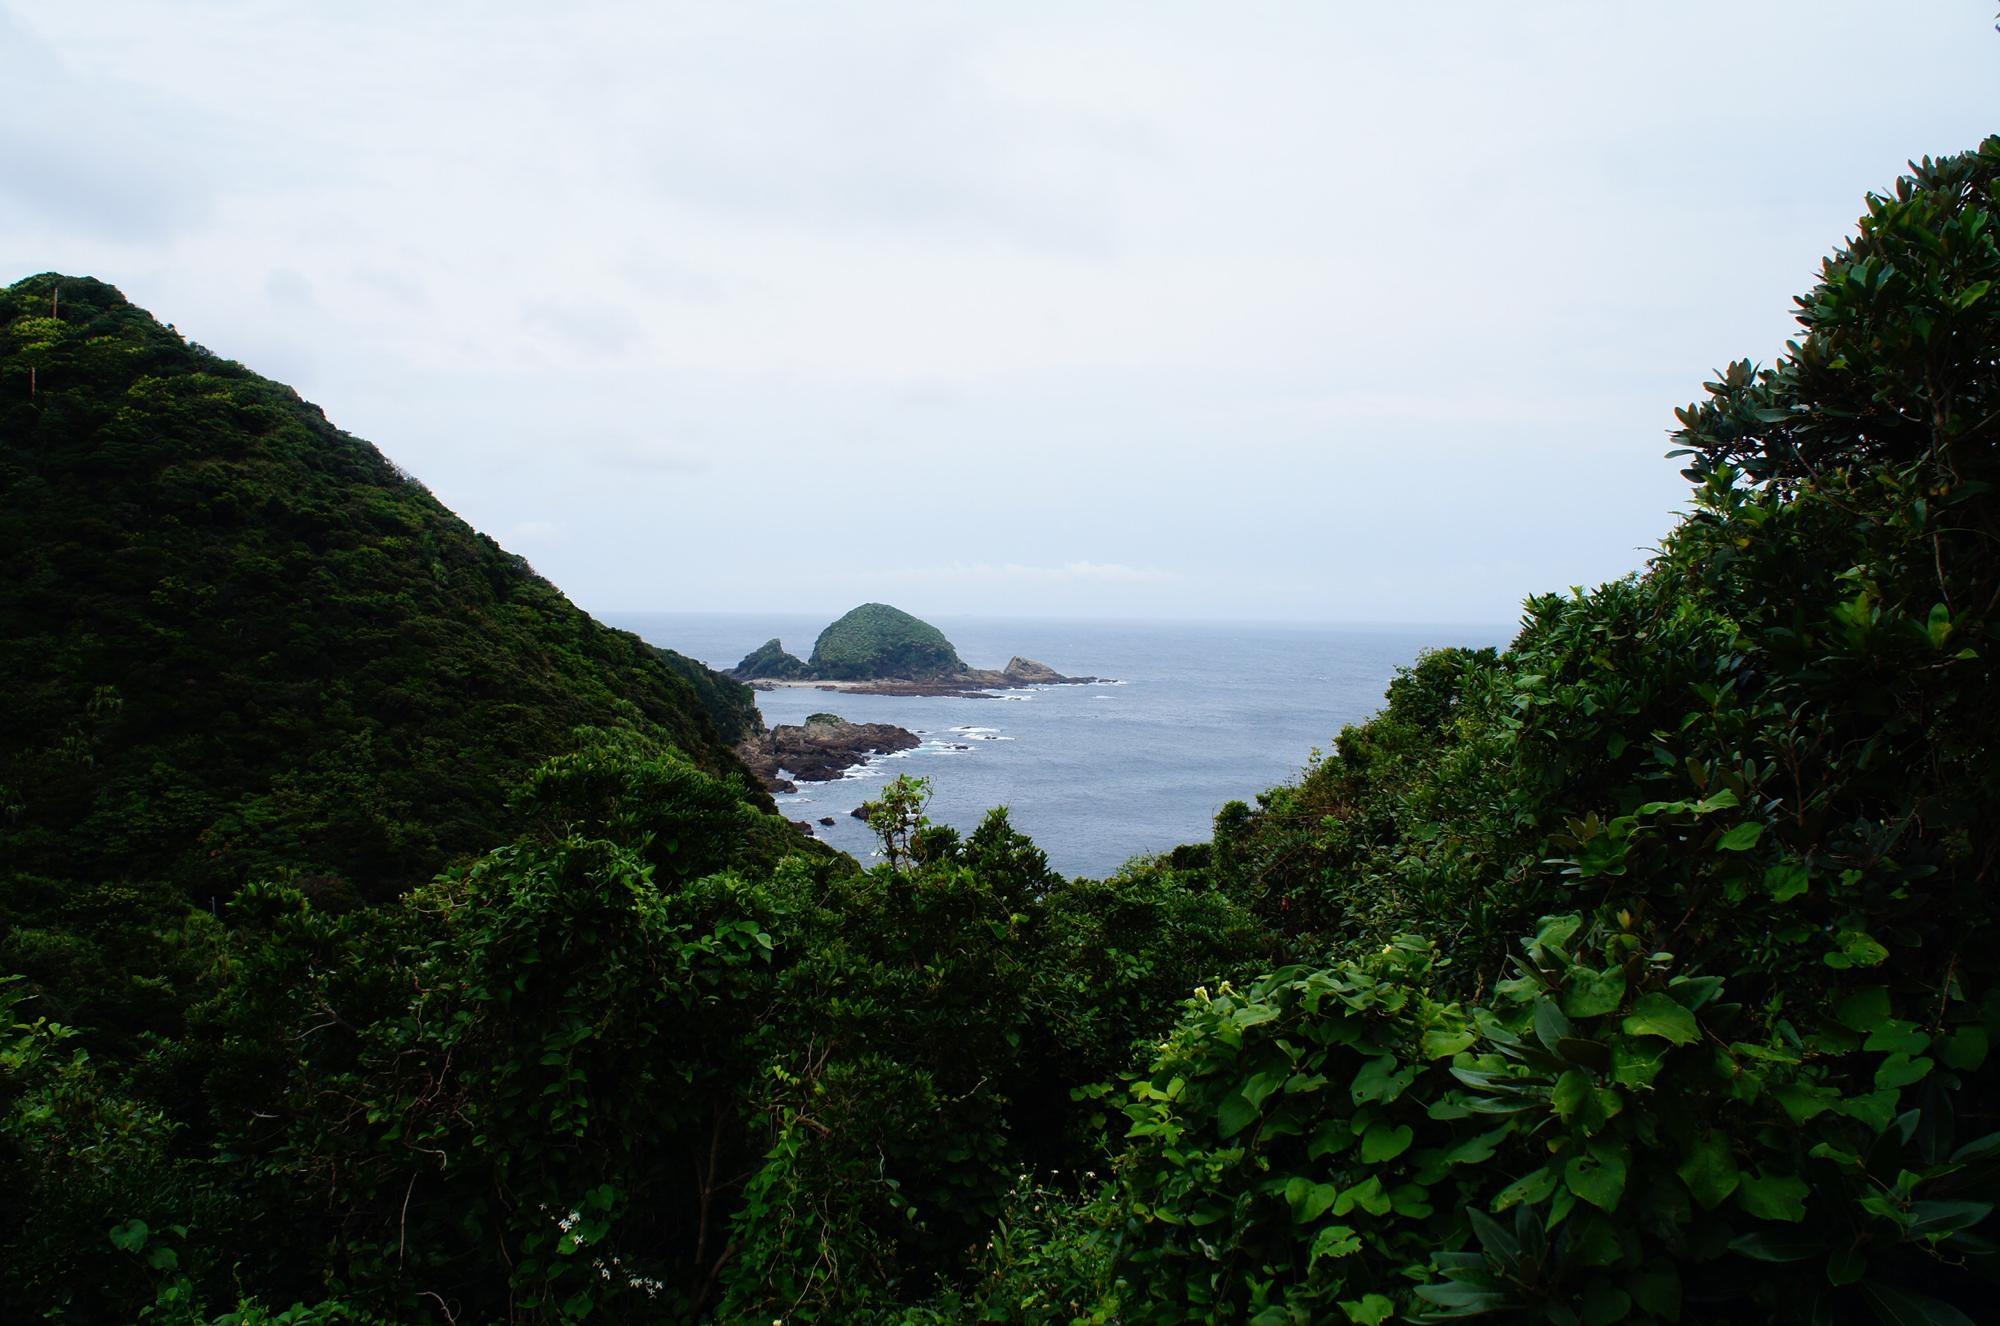 kagoshima_voyage_2015_DSC01235.jpg